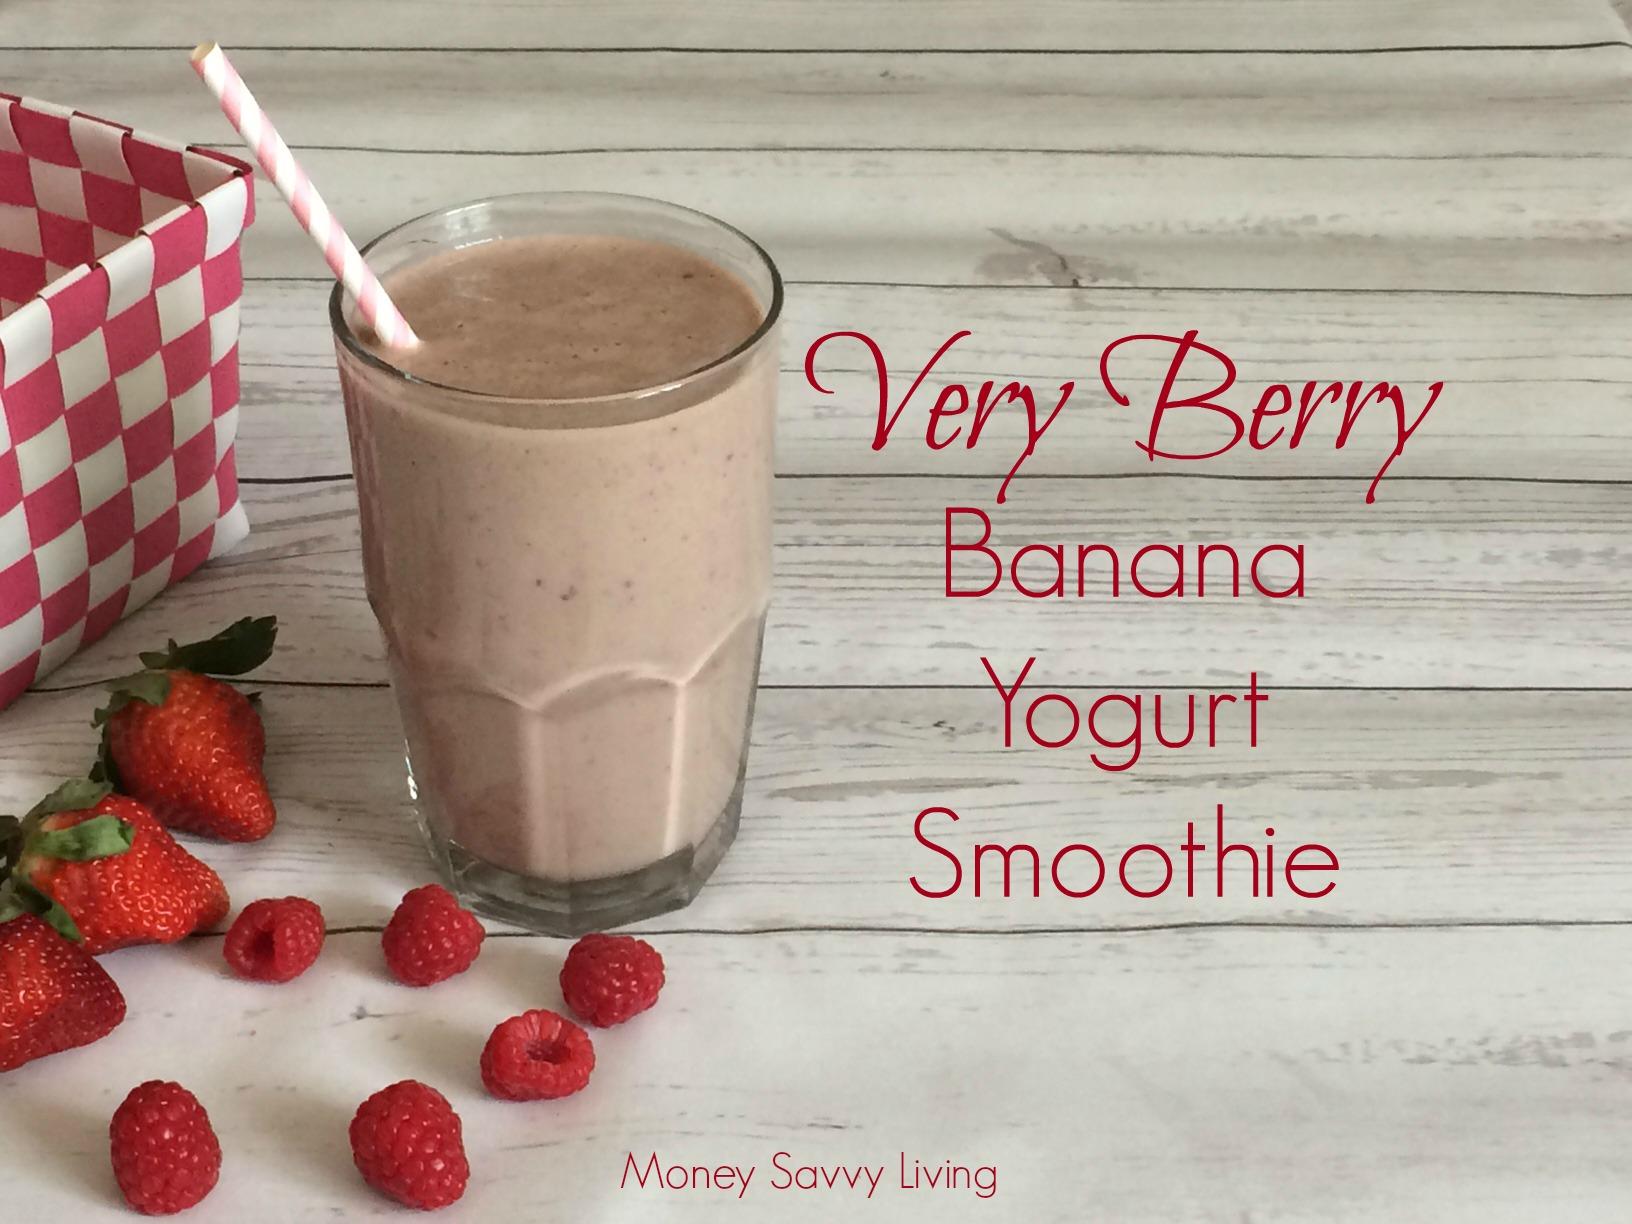 Banana-Yogurt Smoothie Recipe — Dishmaps